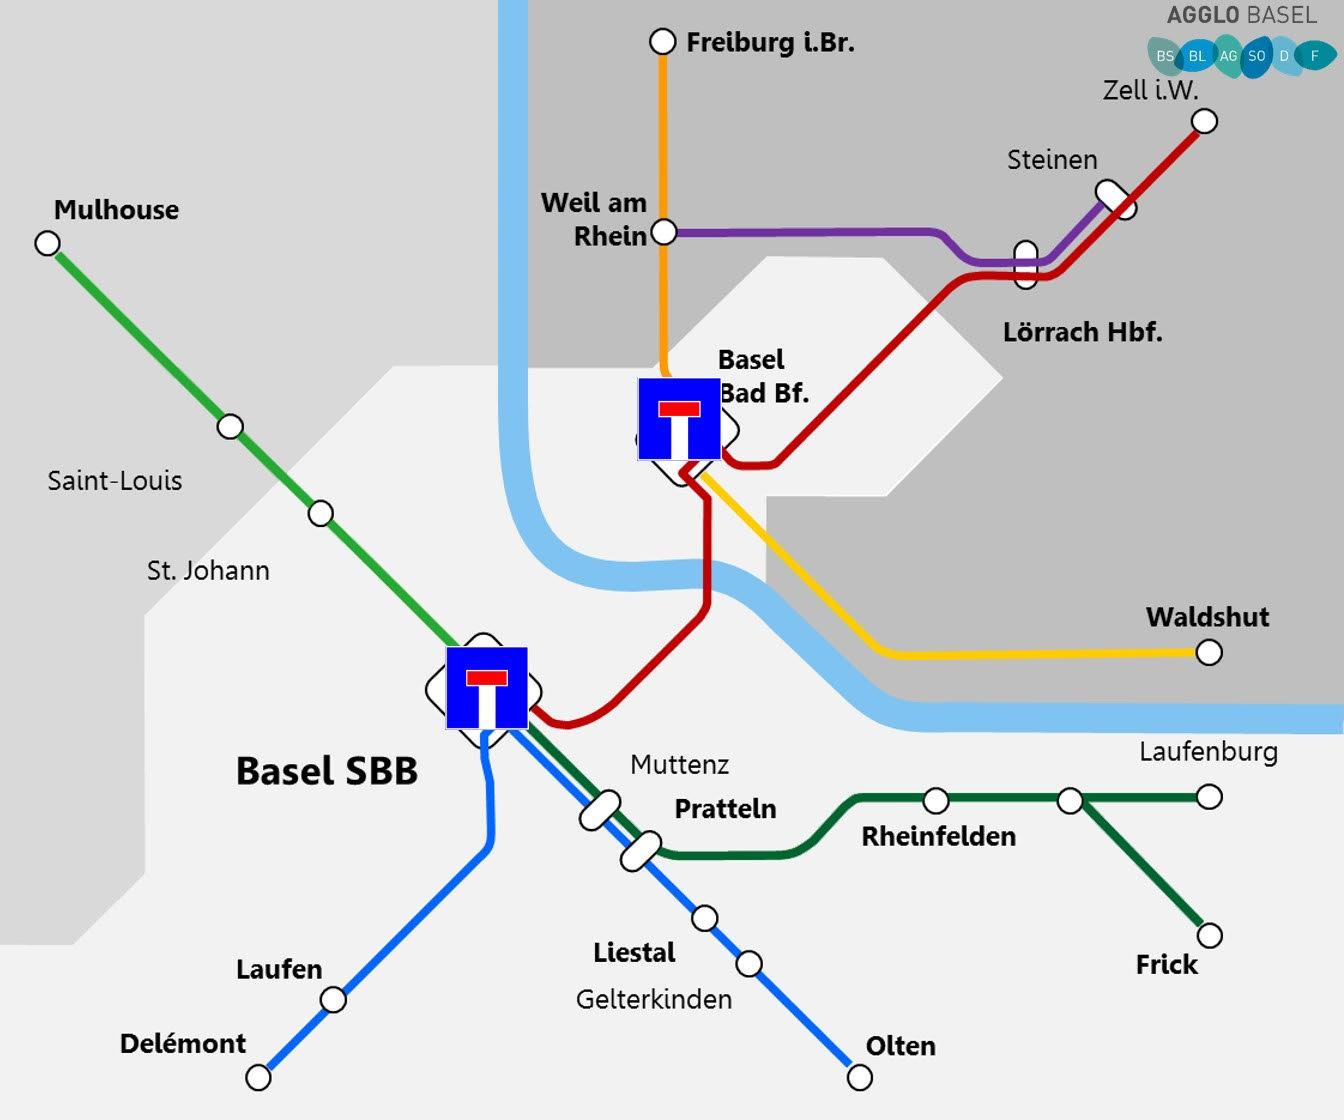 Sackgasse Basler Bahnhöfe: So verläuft das Bahnnetz im Moment durch Basel.